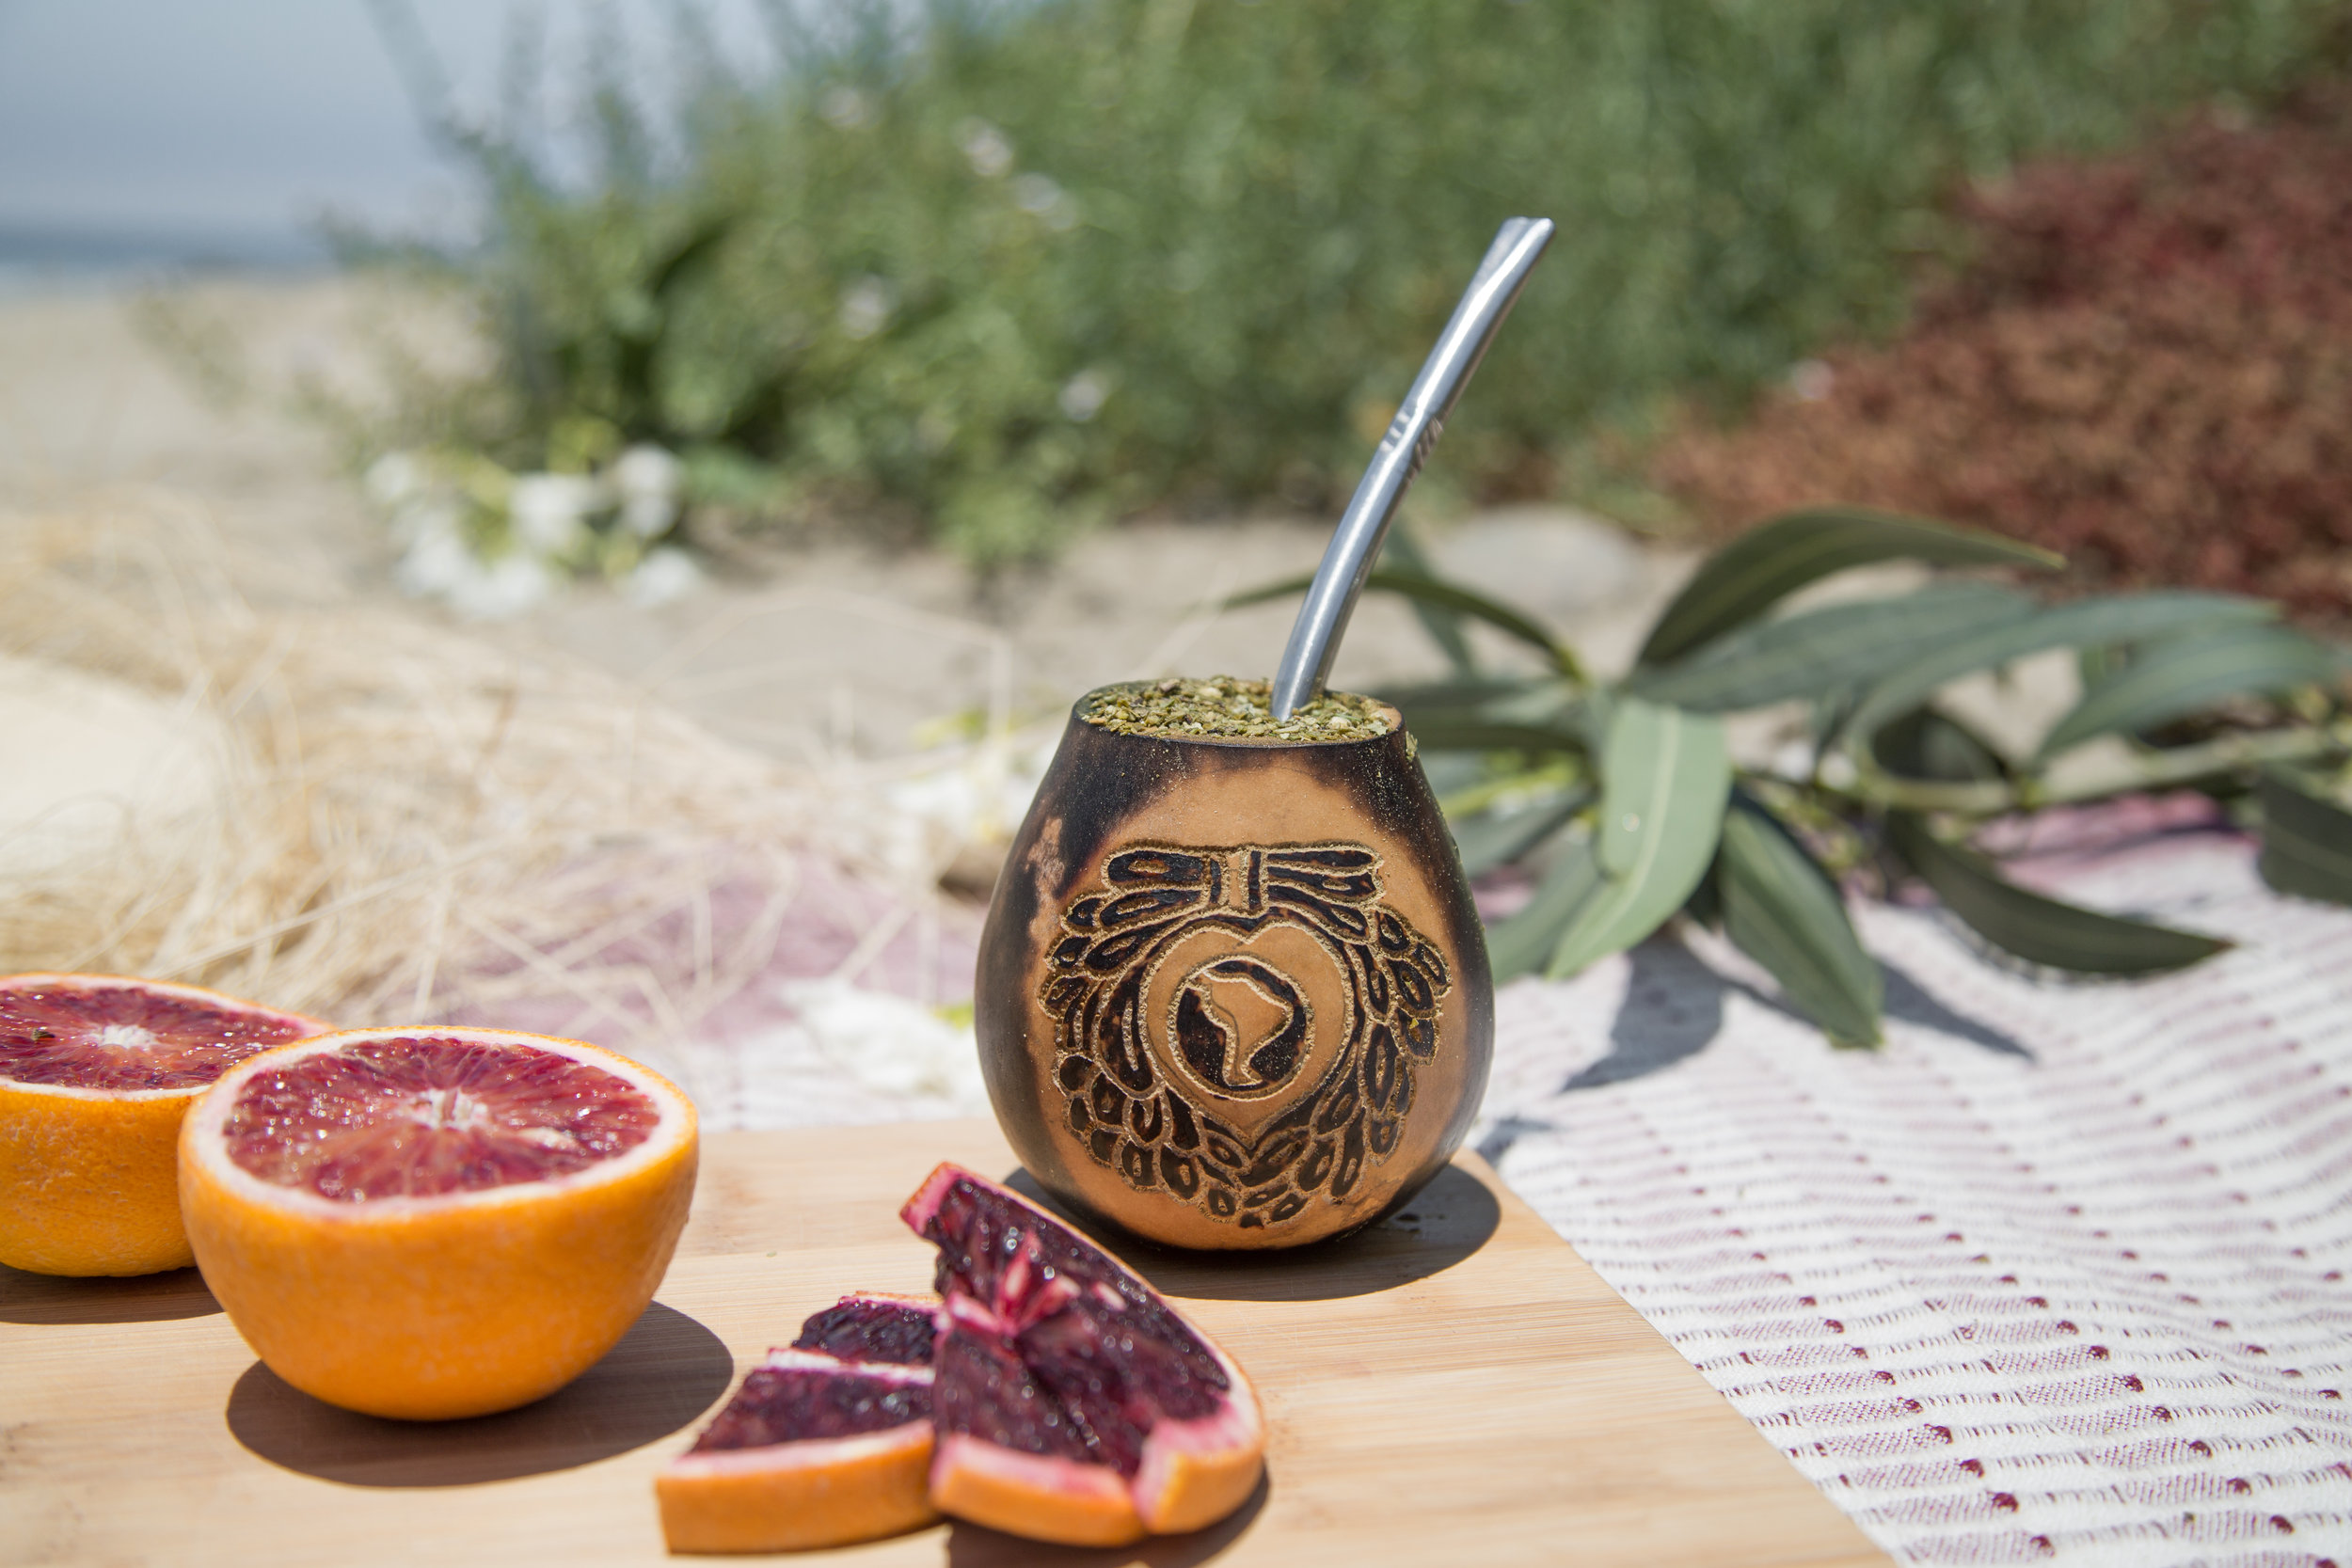 Owl House Creative - Guayaki Blood Orange & Summer Picnic Campaign